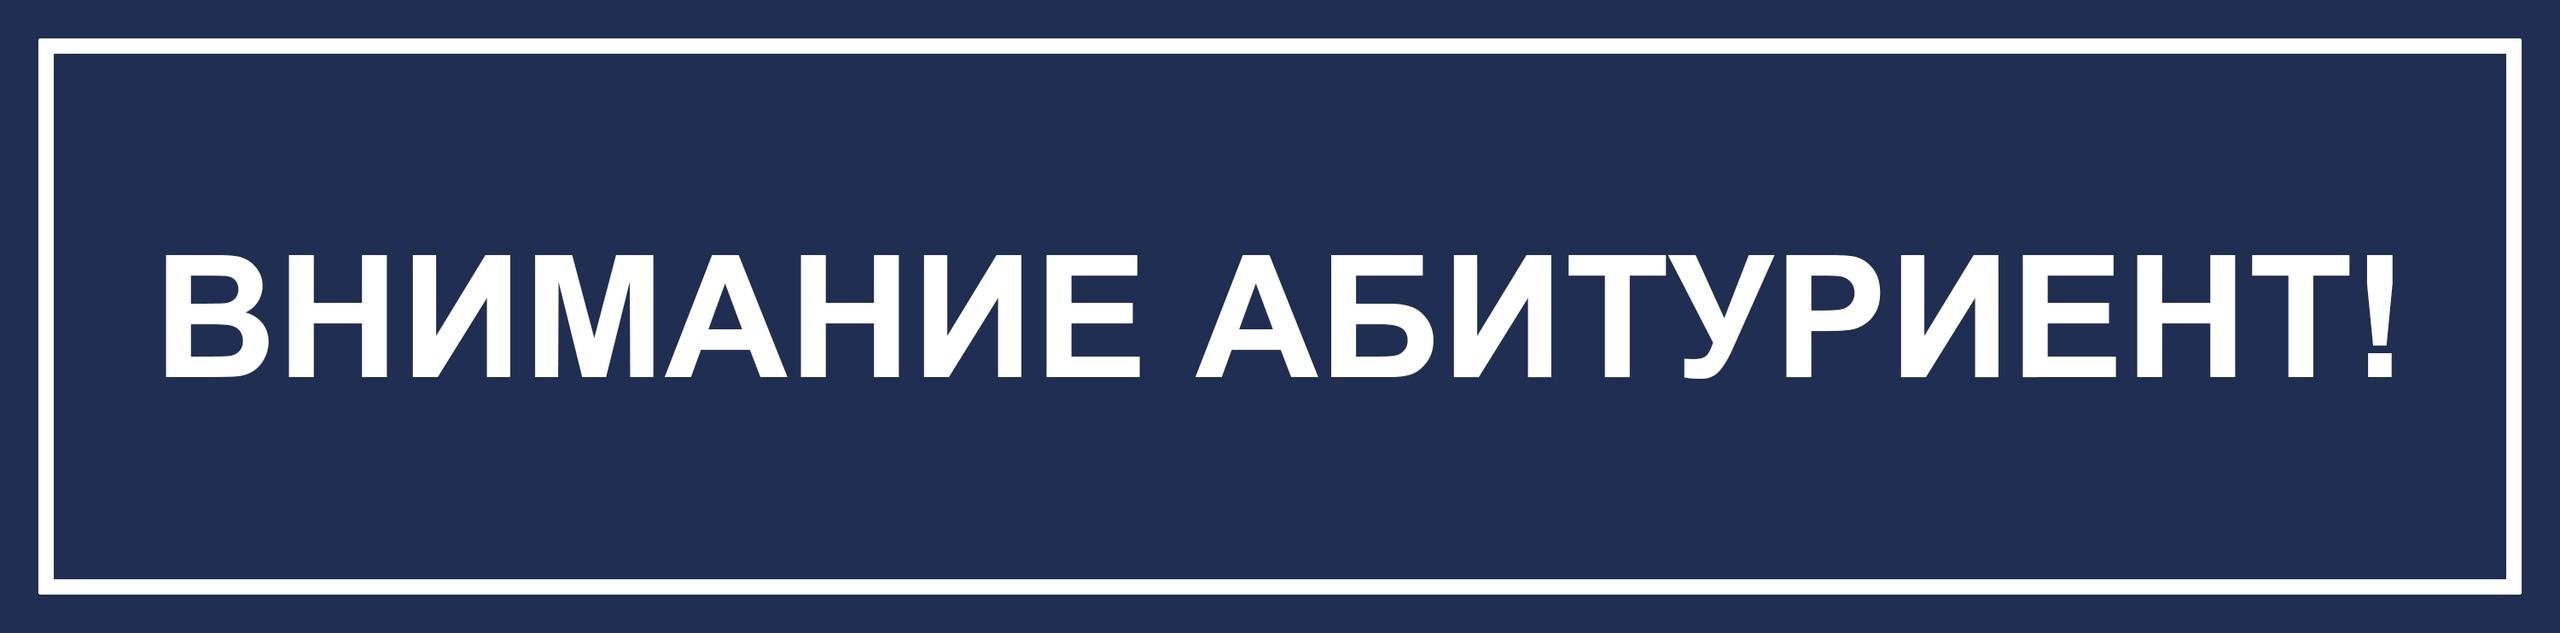 ВНИМАНИЕ АБИТУРИЕНТ!